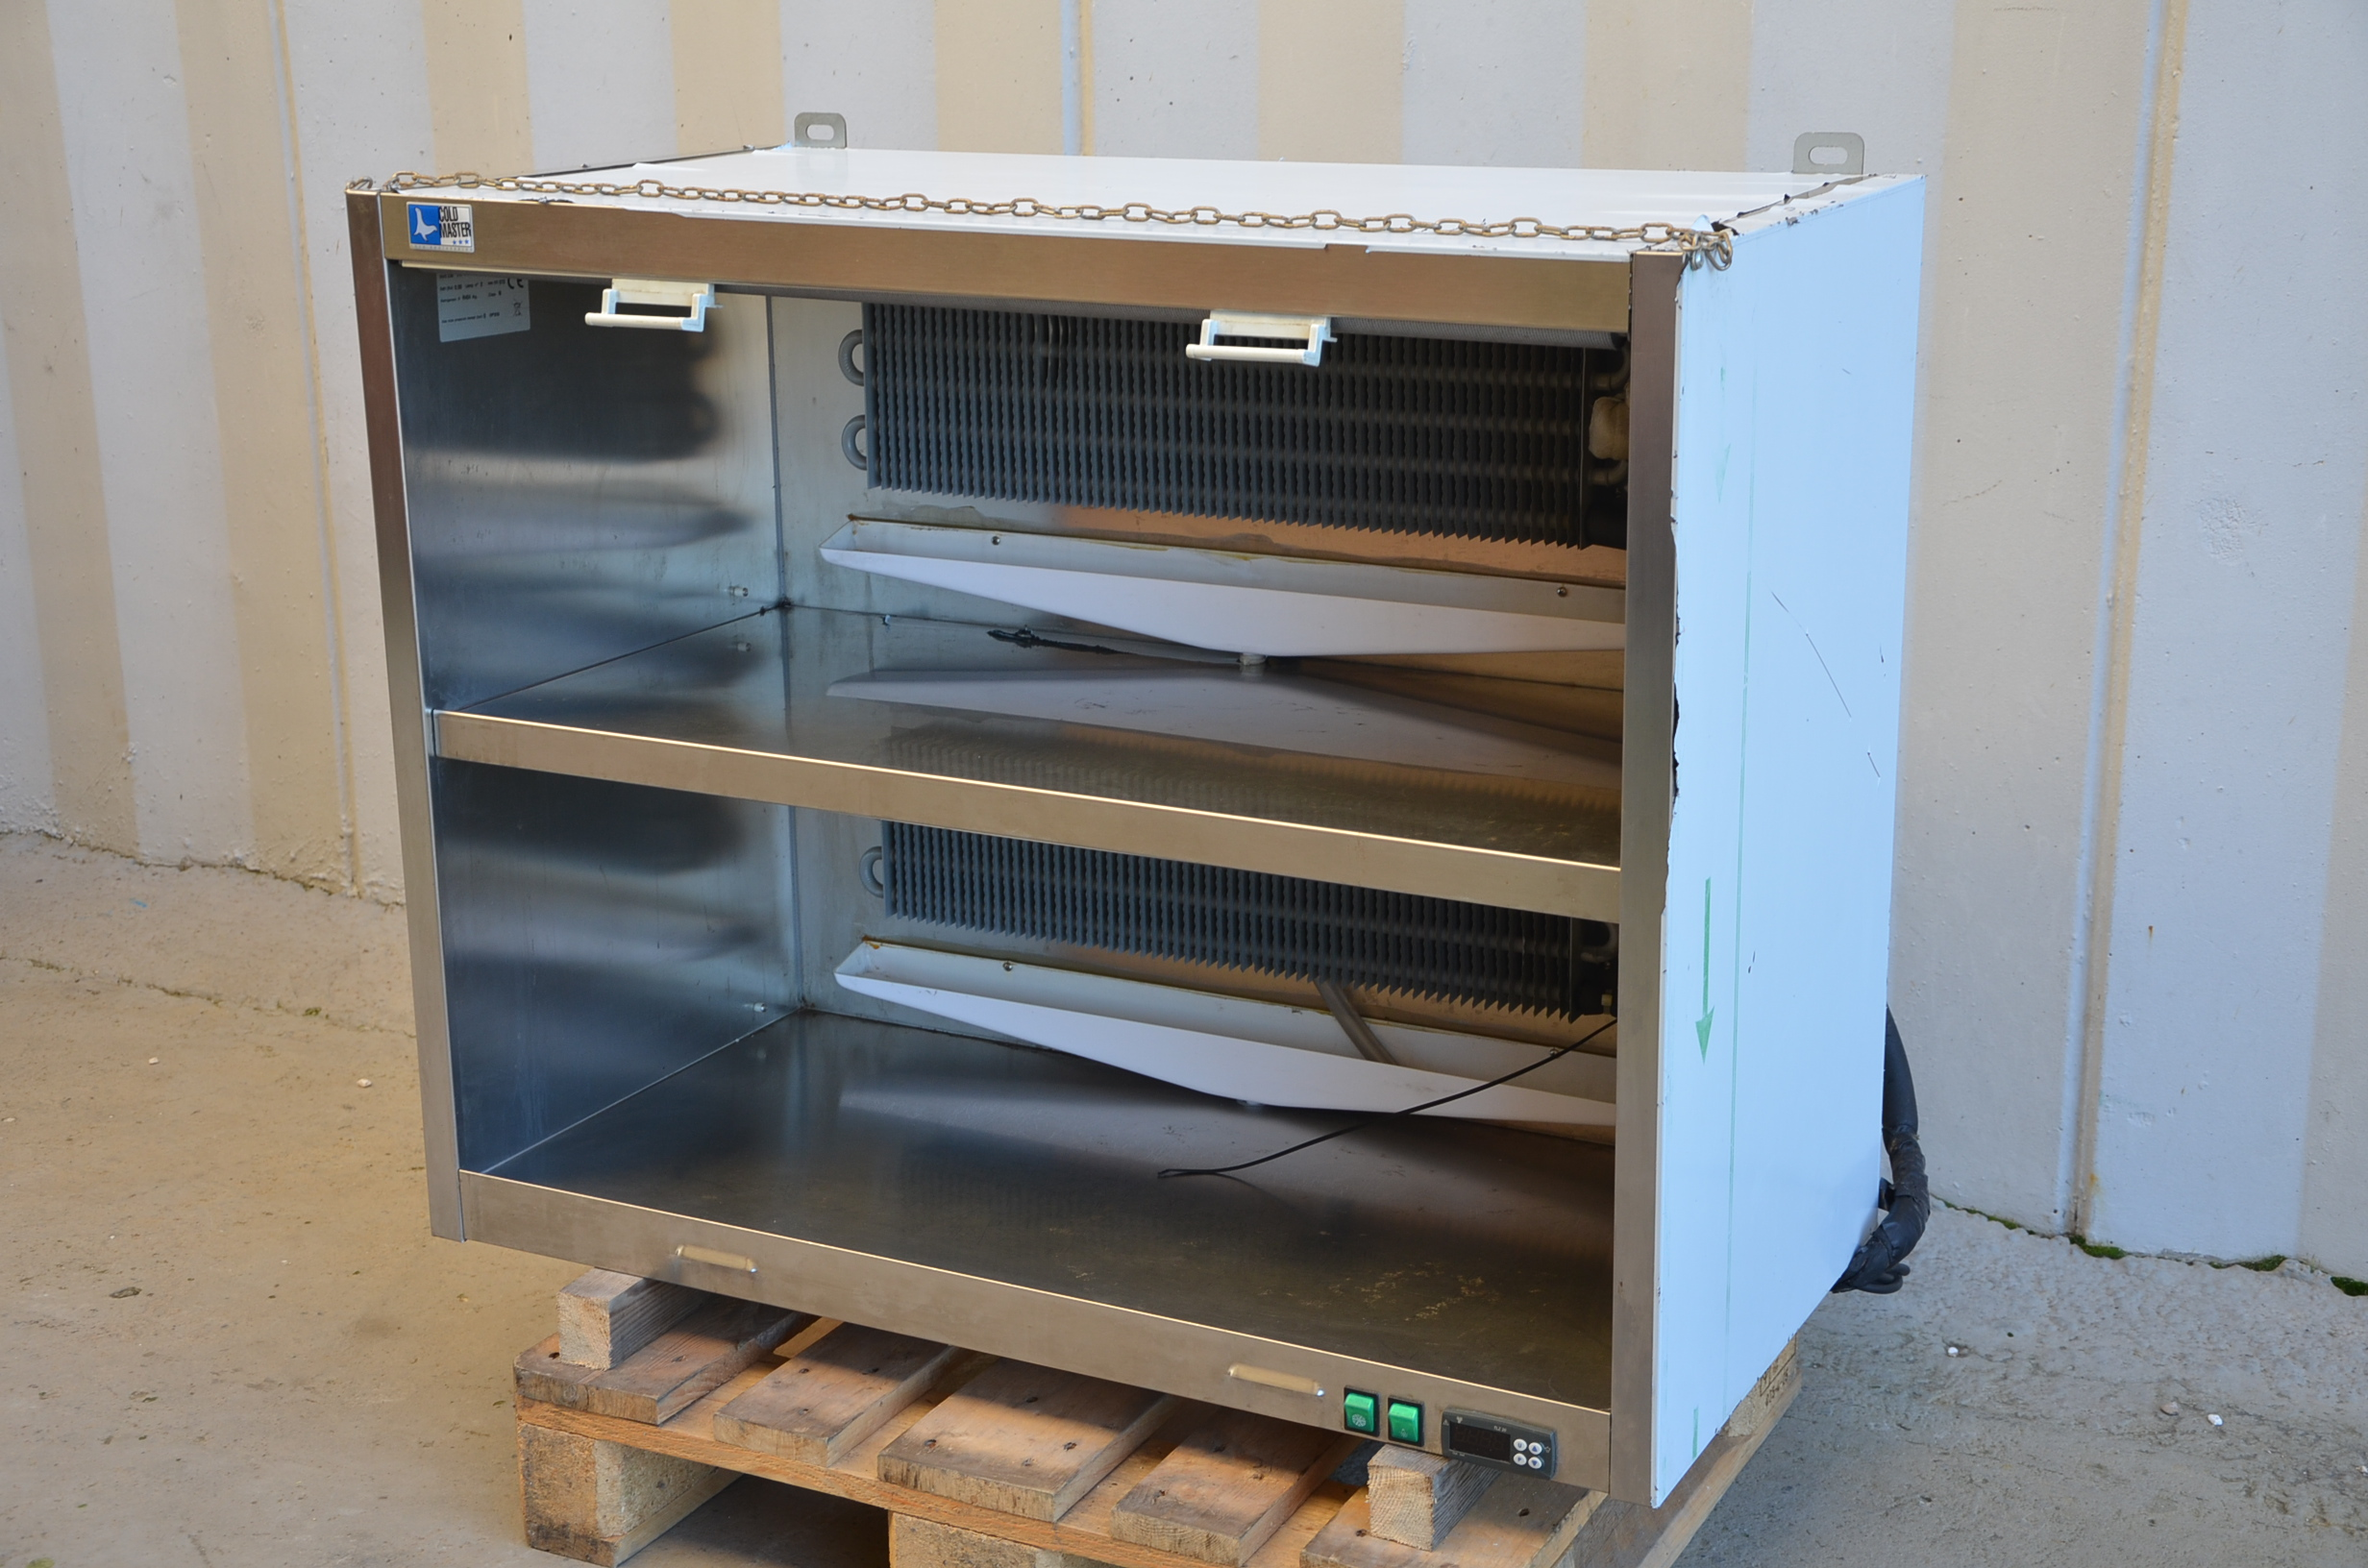 Pensile refrigerato senza gruppo frigo - Tecfrigo in vendita - foto 1